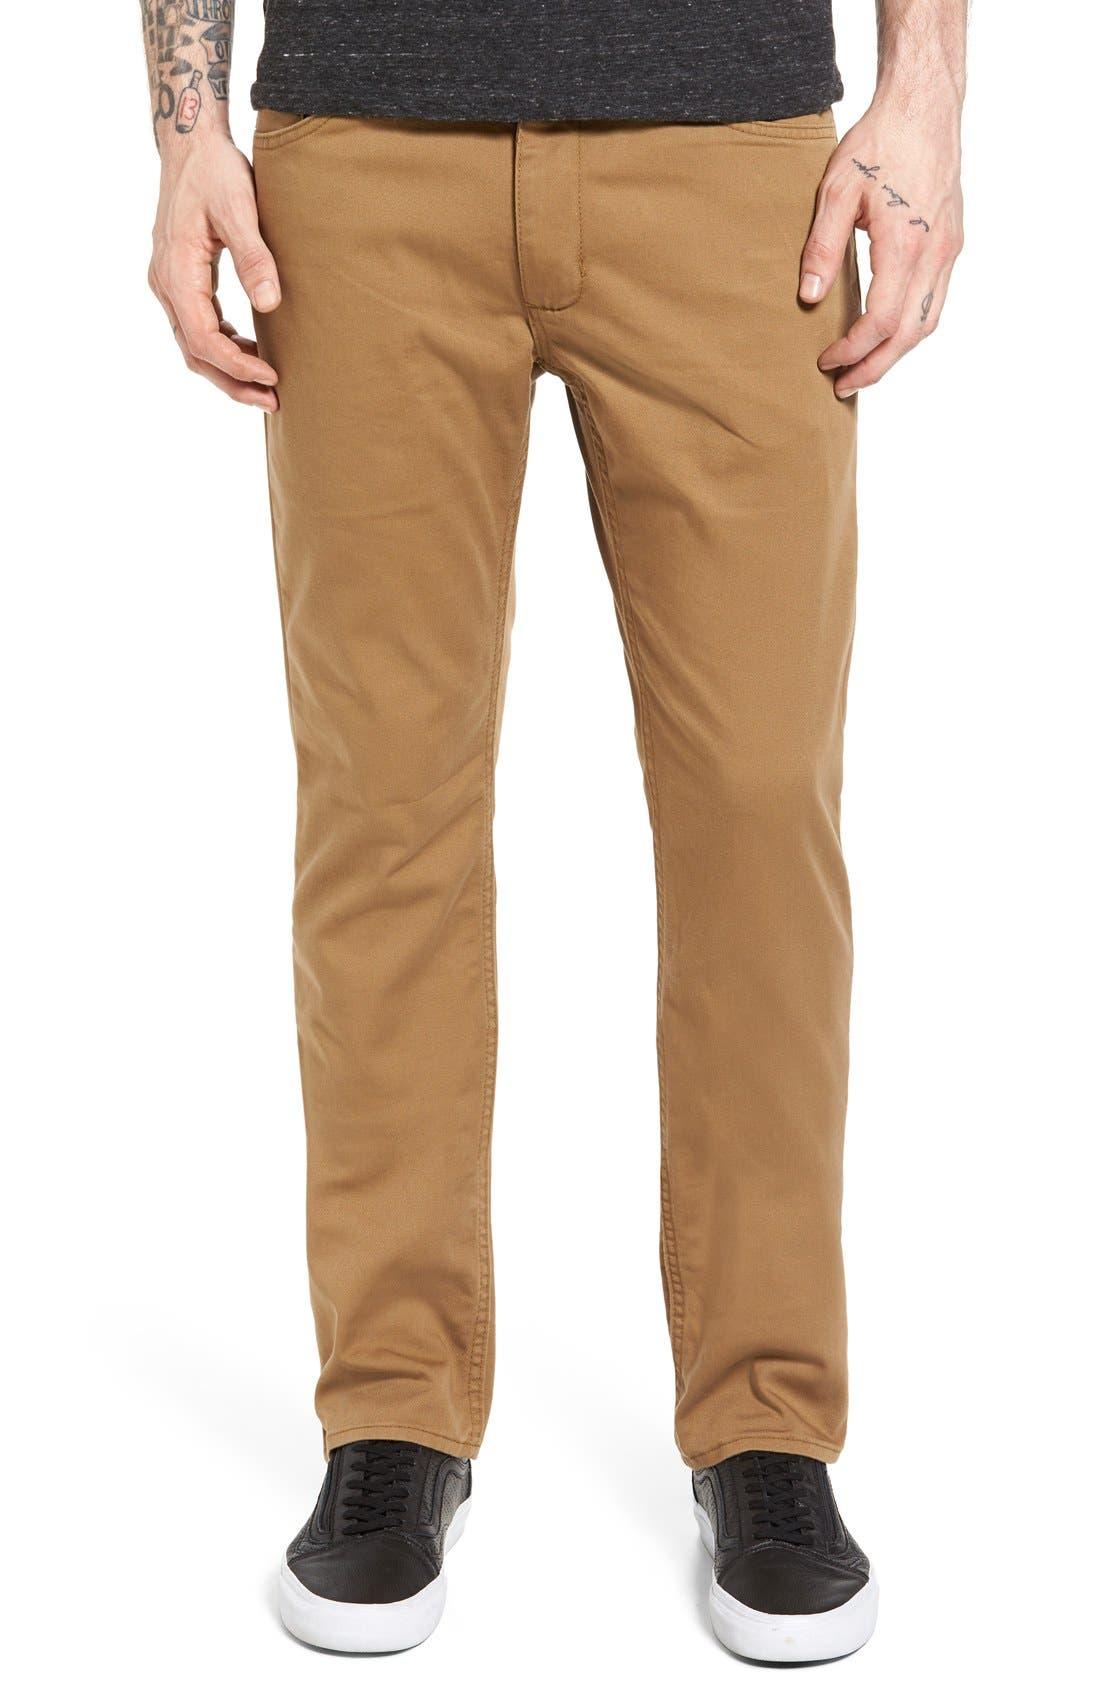 V56 Covina II Slim Fit Pants,                         Main,                         color, Dirt